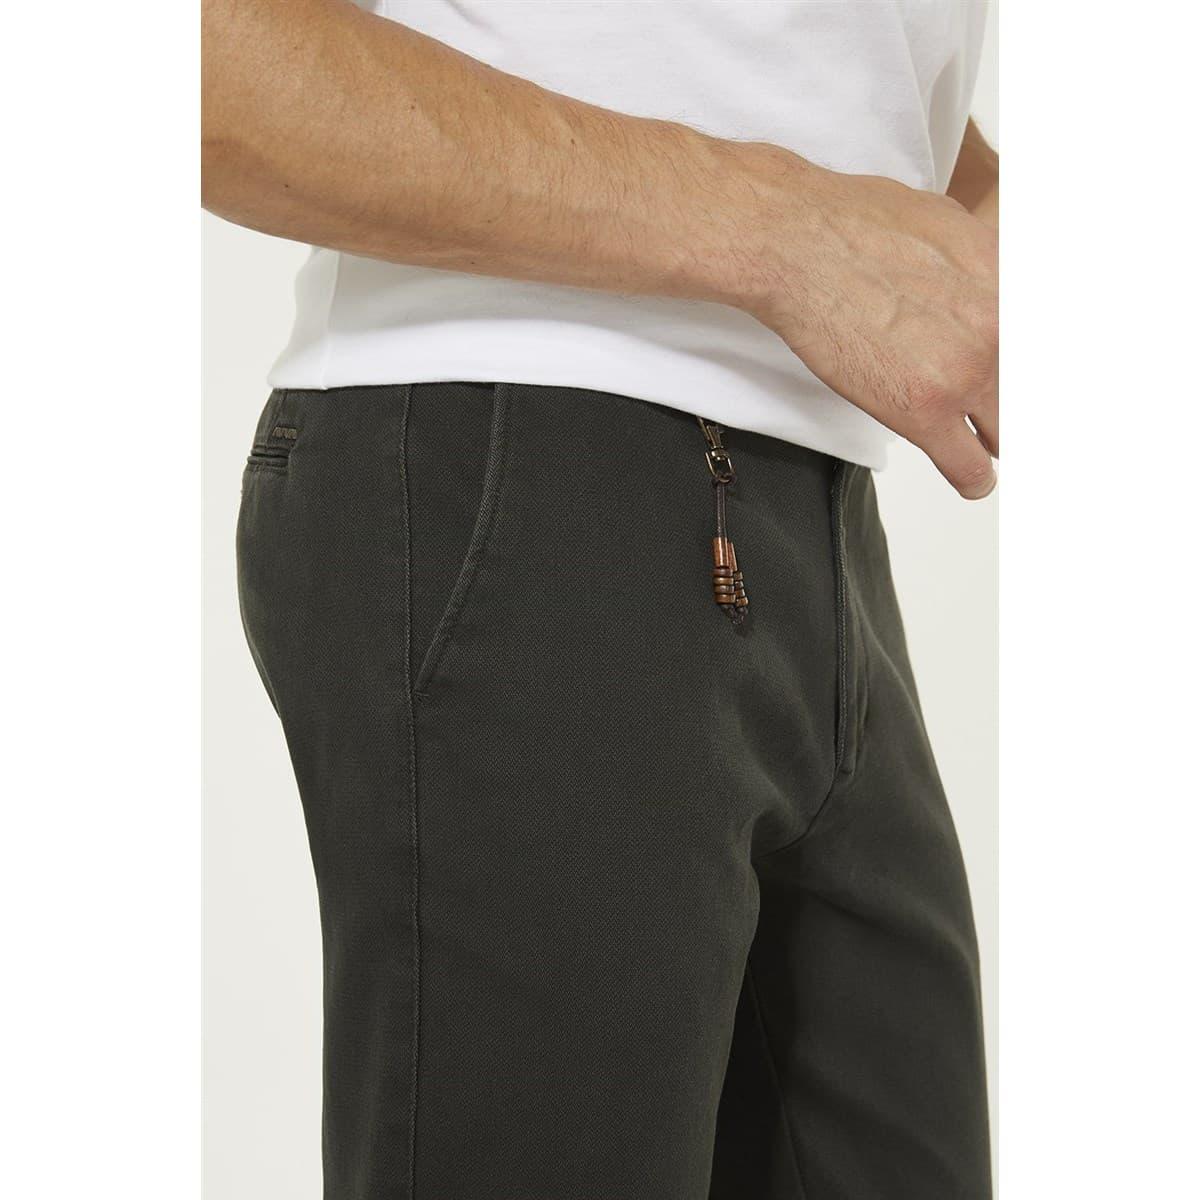 Avva Haki Erkek Pantolon